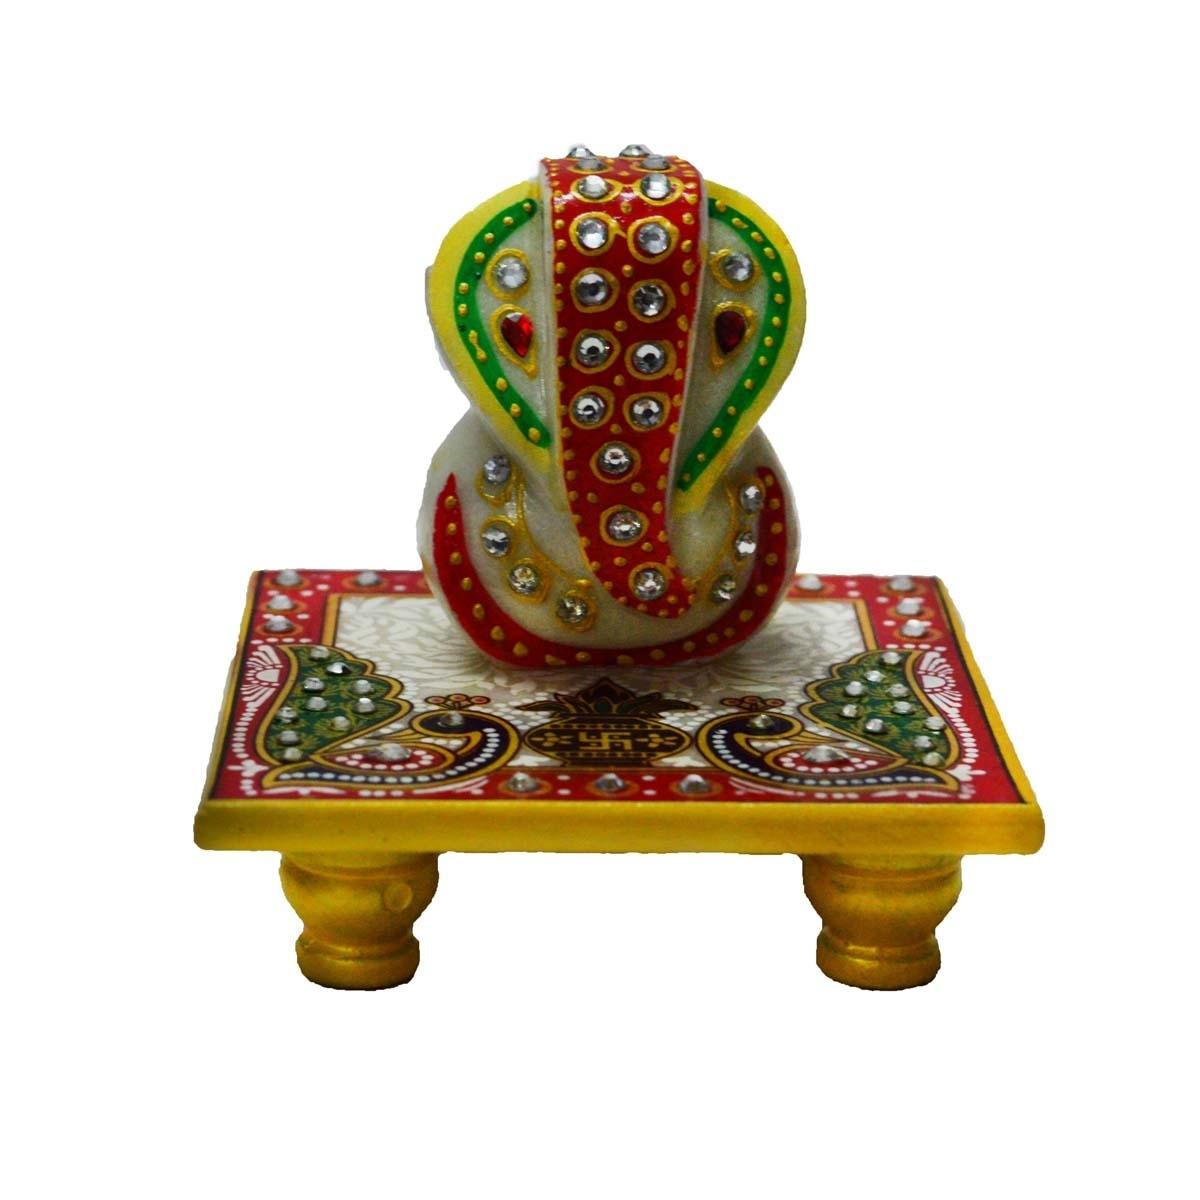 Marble Crystal studded Lord Ganesha Chowki with Peocock and Kalash Indian Home Decor